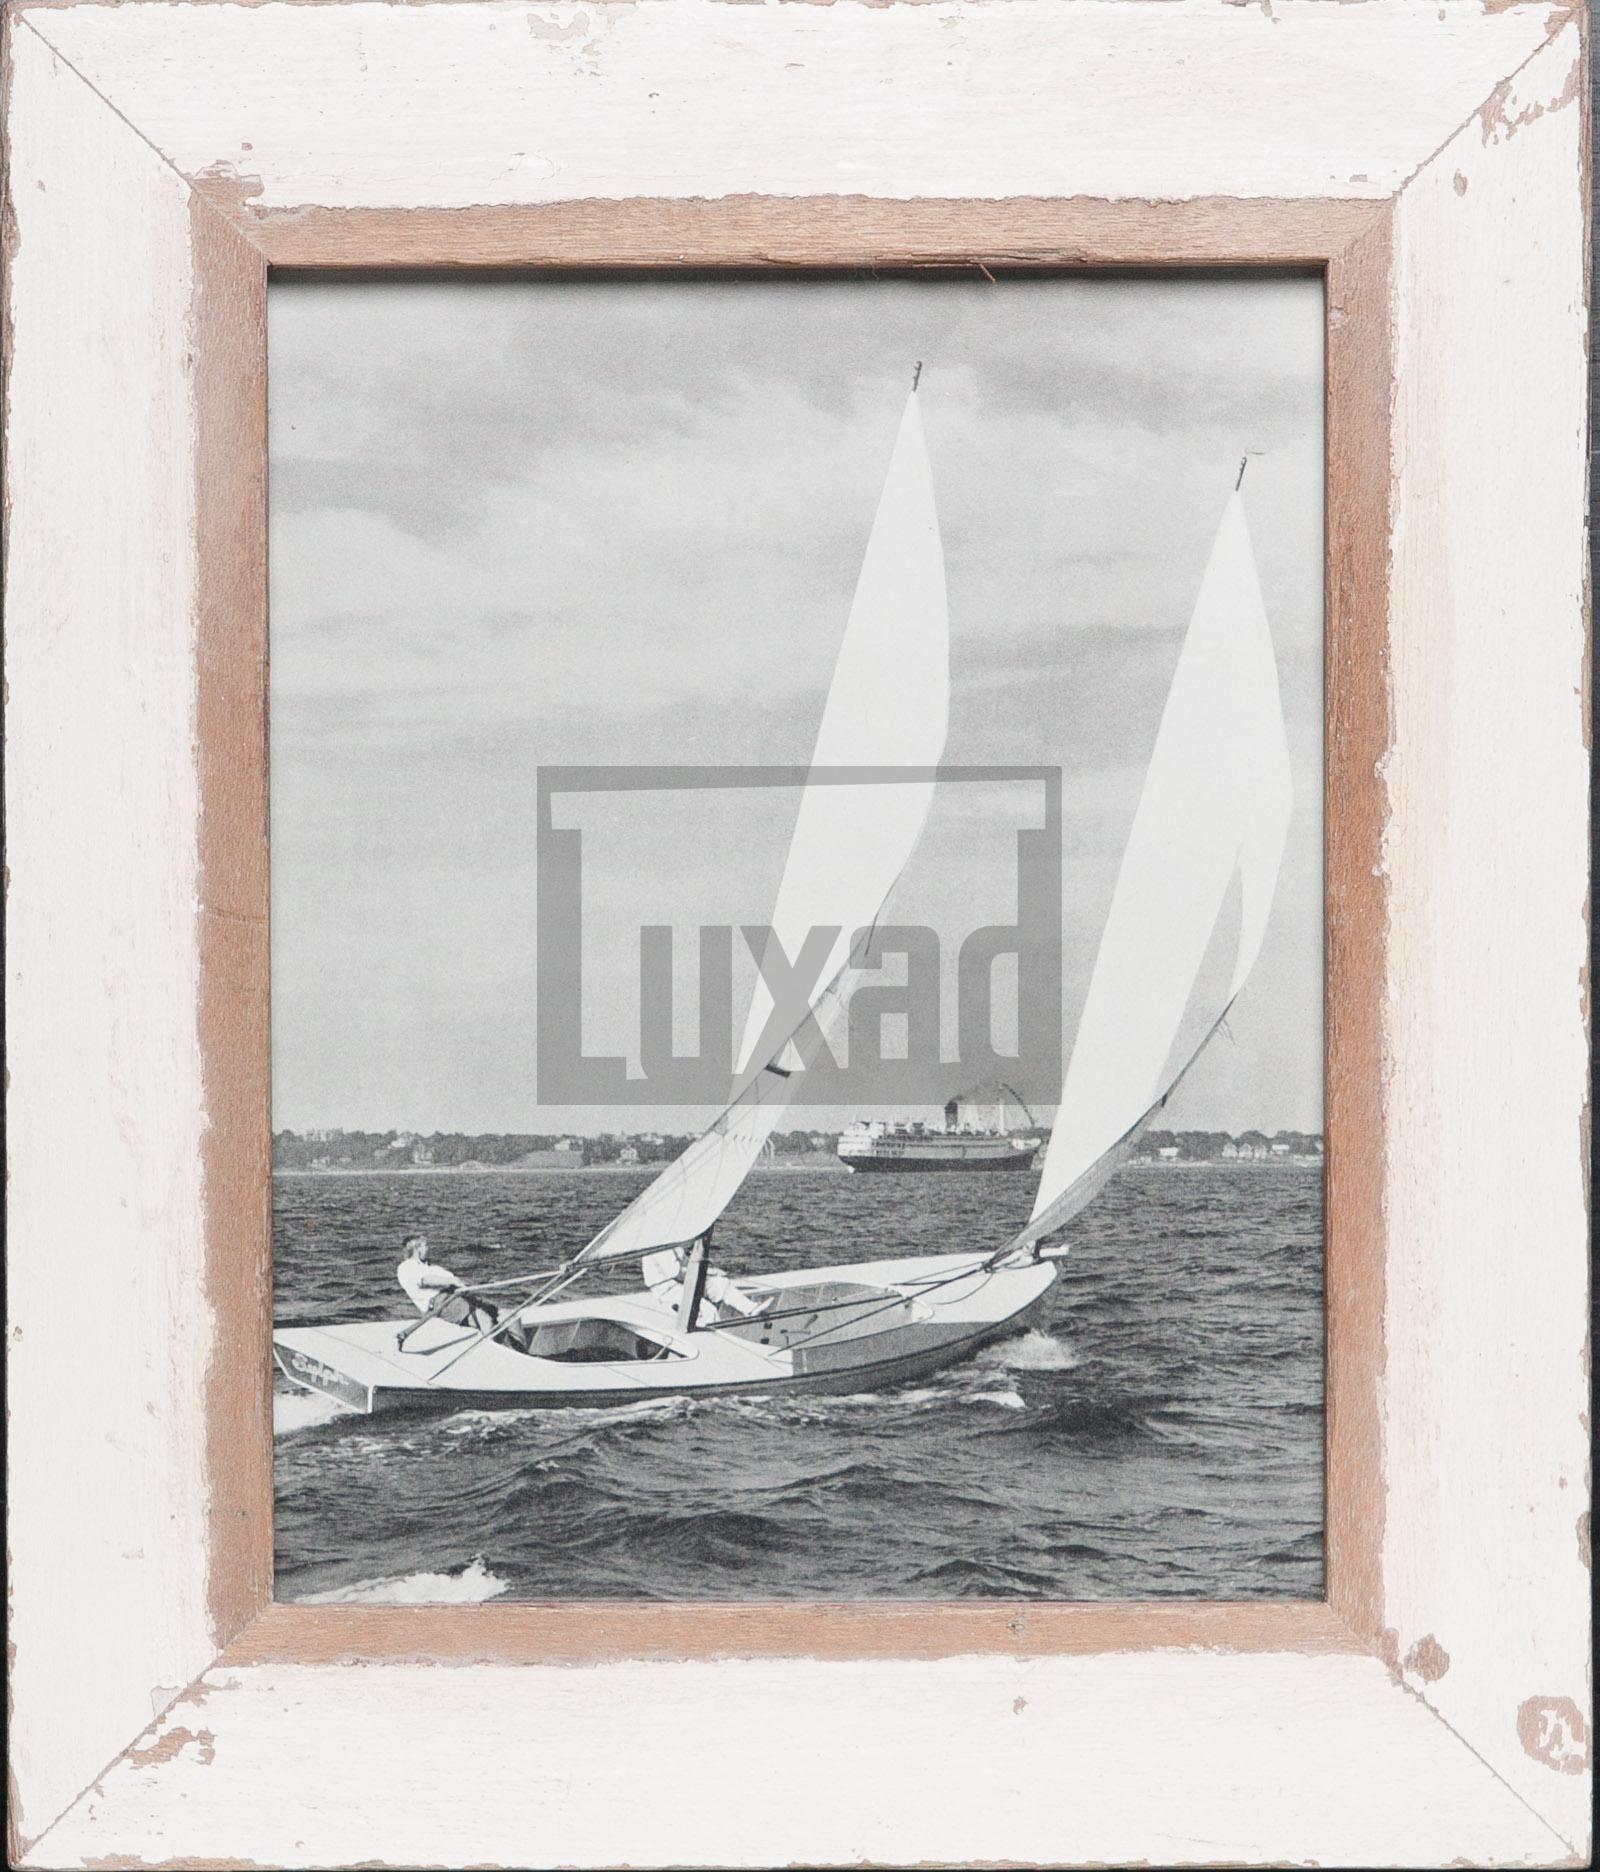 Vintage-Bilderrahmen aus altem Holz für Fotos 20 x 25 cm